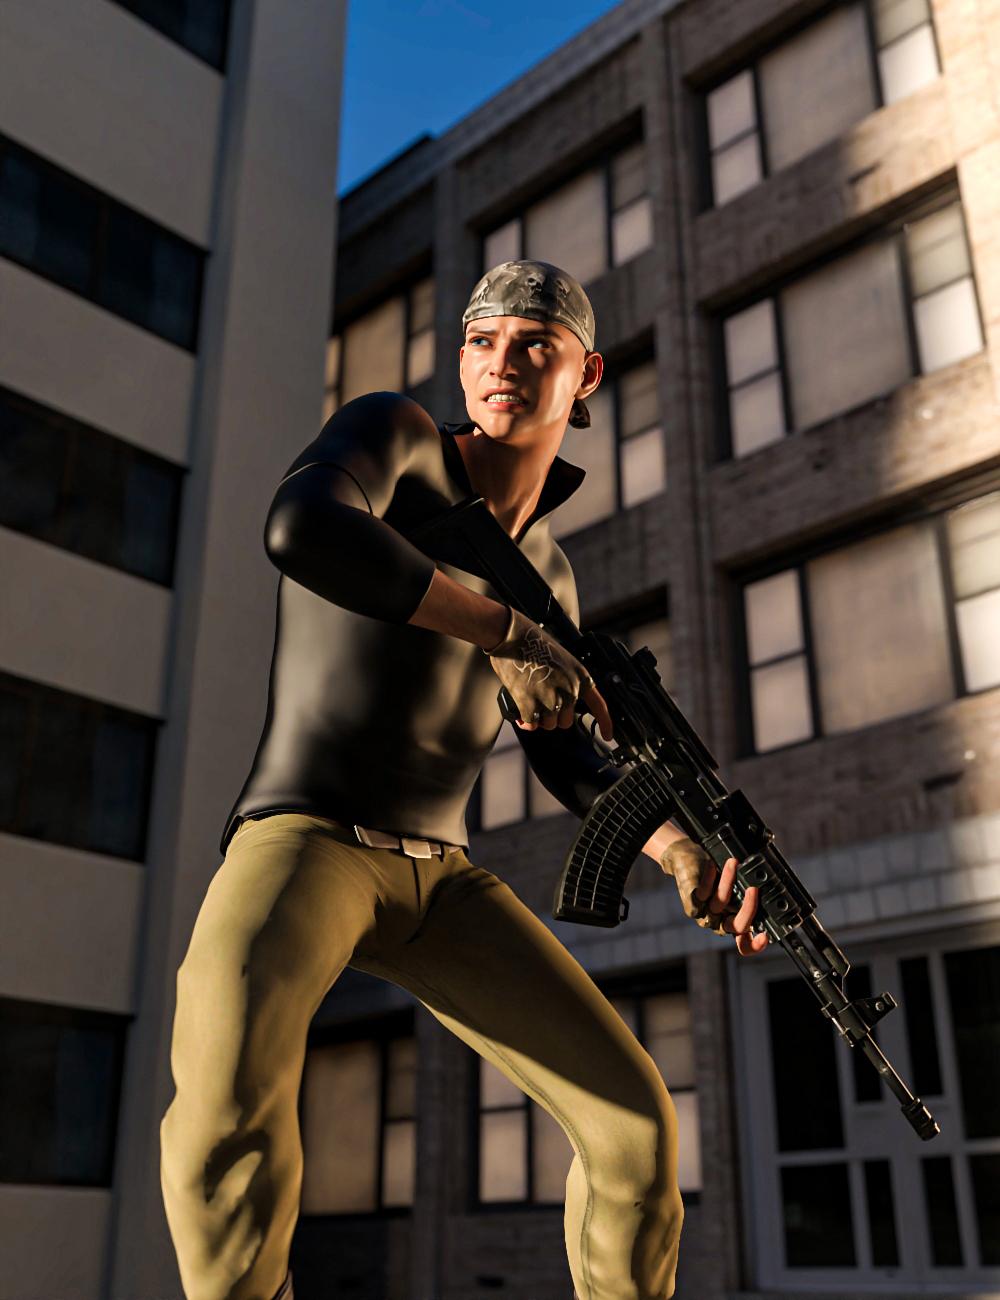 Black Snake Assault Rifle Pose for Genesis 8 by: mossberg, 3D Models by Daz 3D